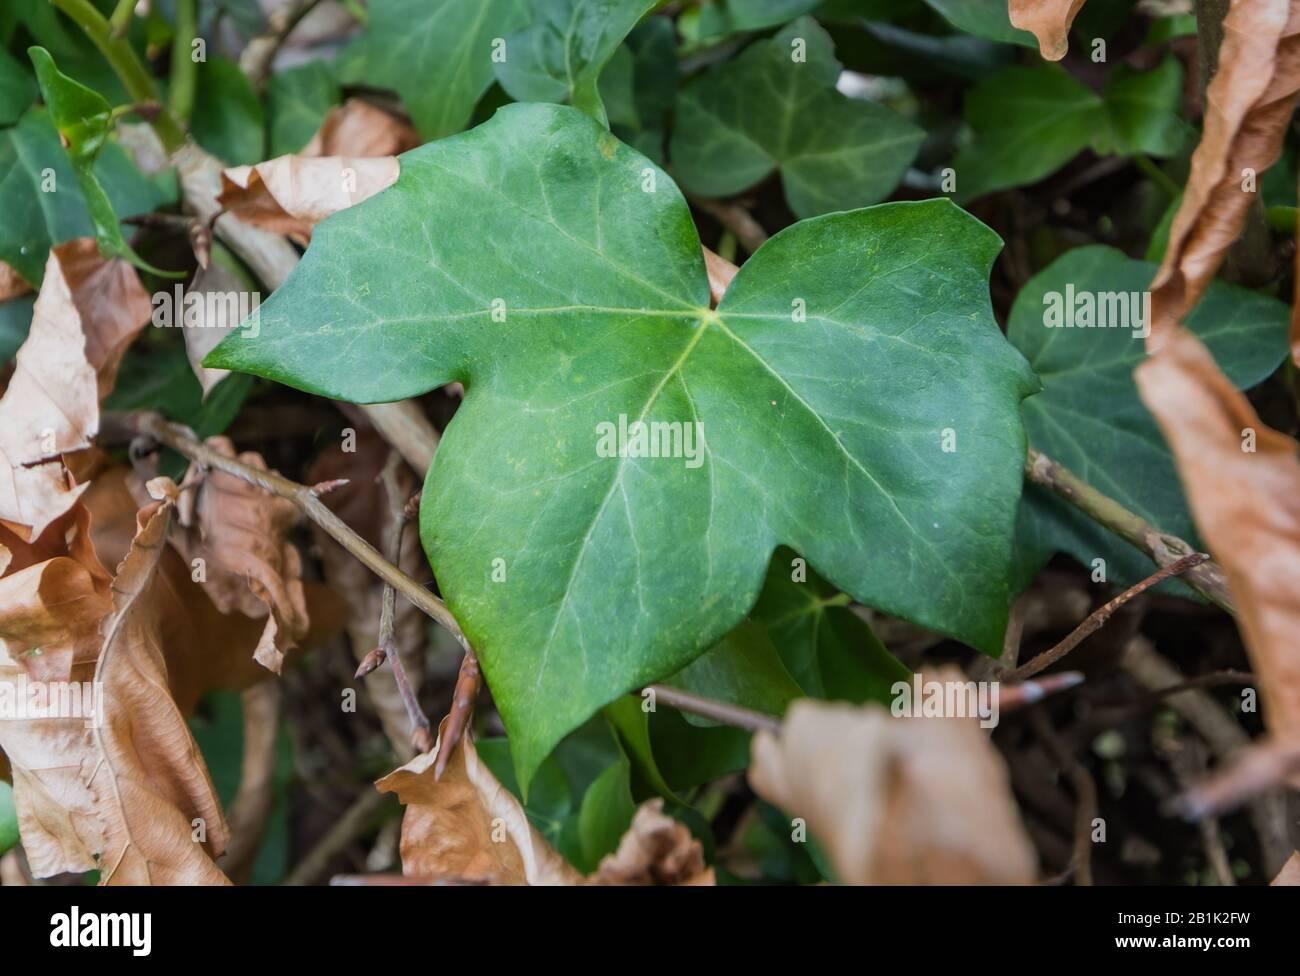 Verde scuro sempreverde foglia palmately lobed da Ivy inglese (Ivy comune, Hedera elica). Foglie con 3 lobi. Foto Stock